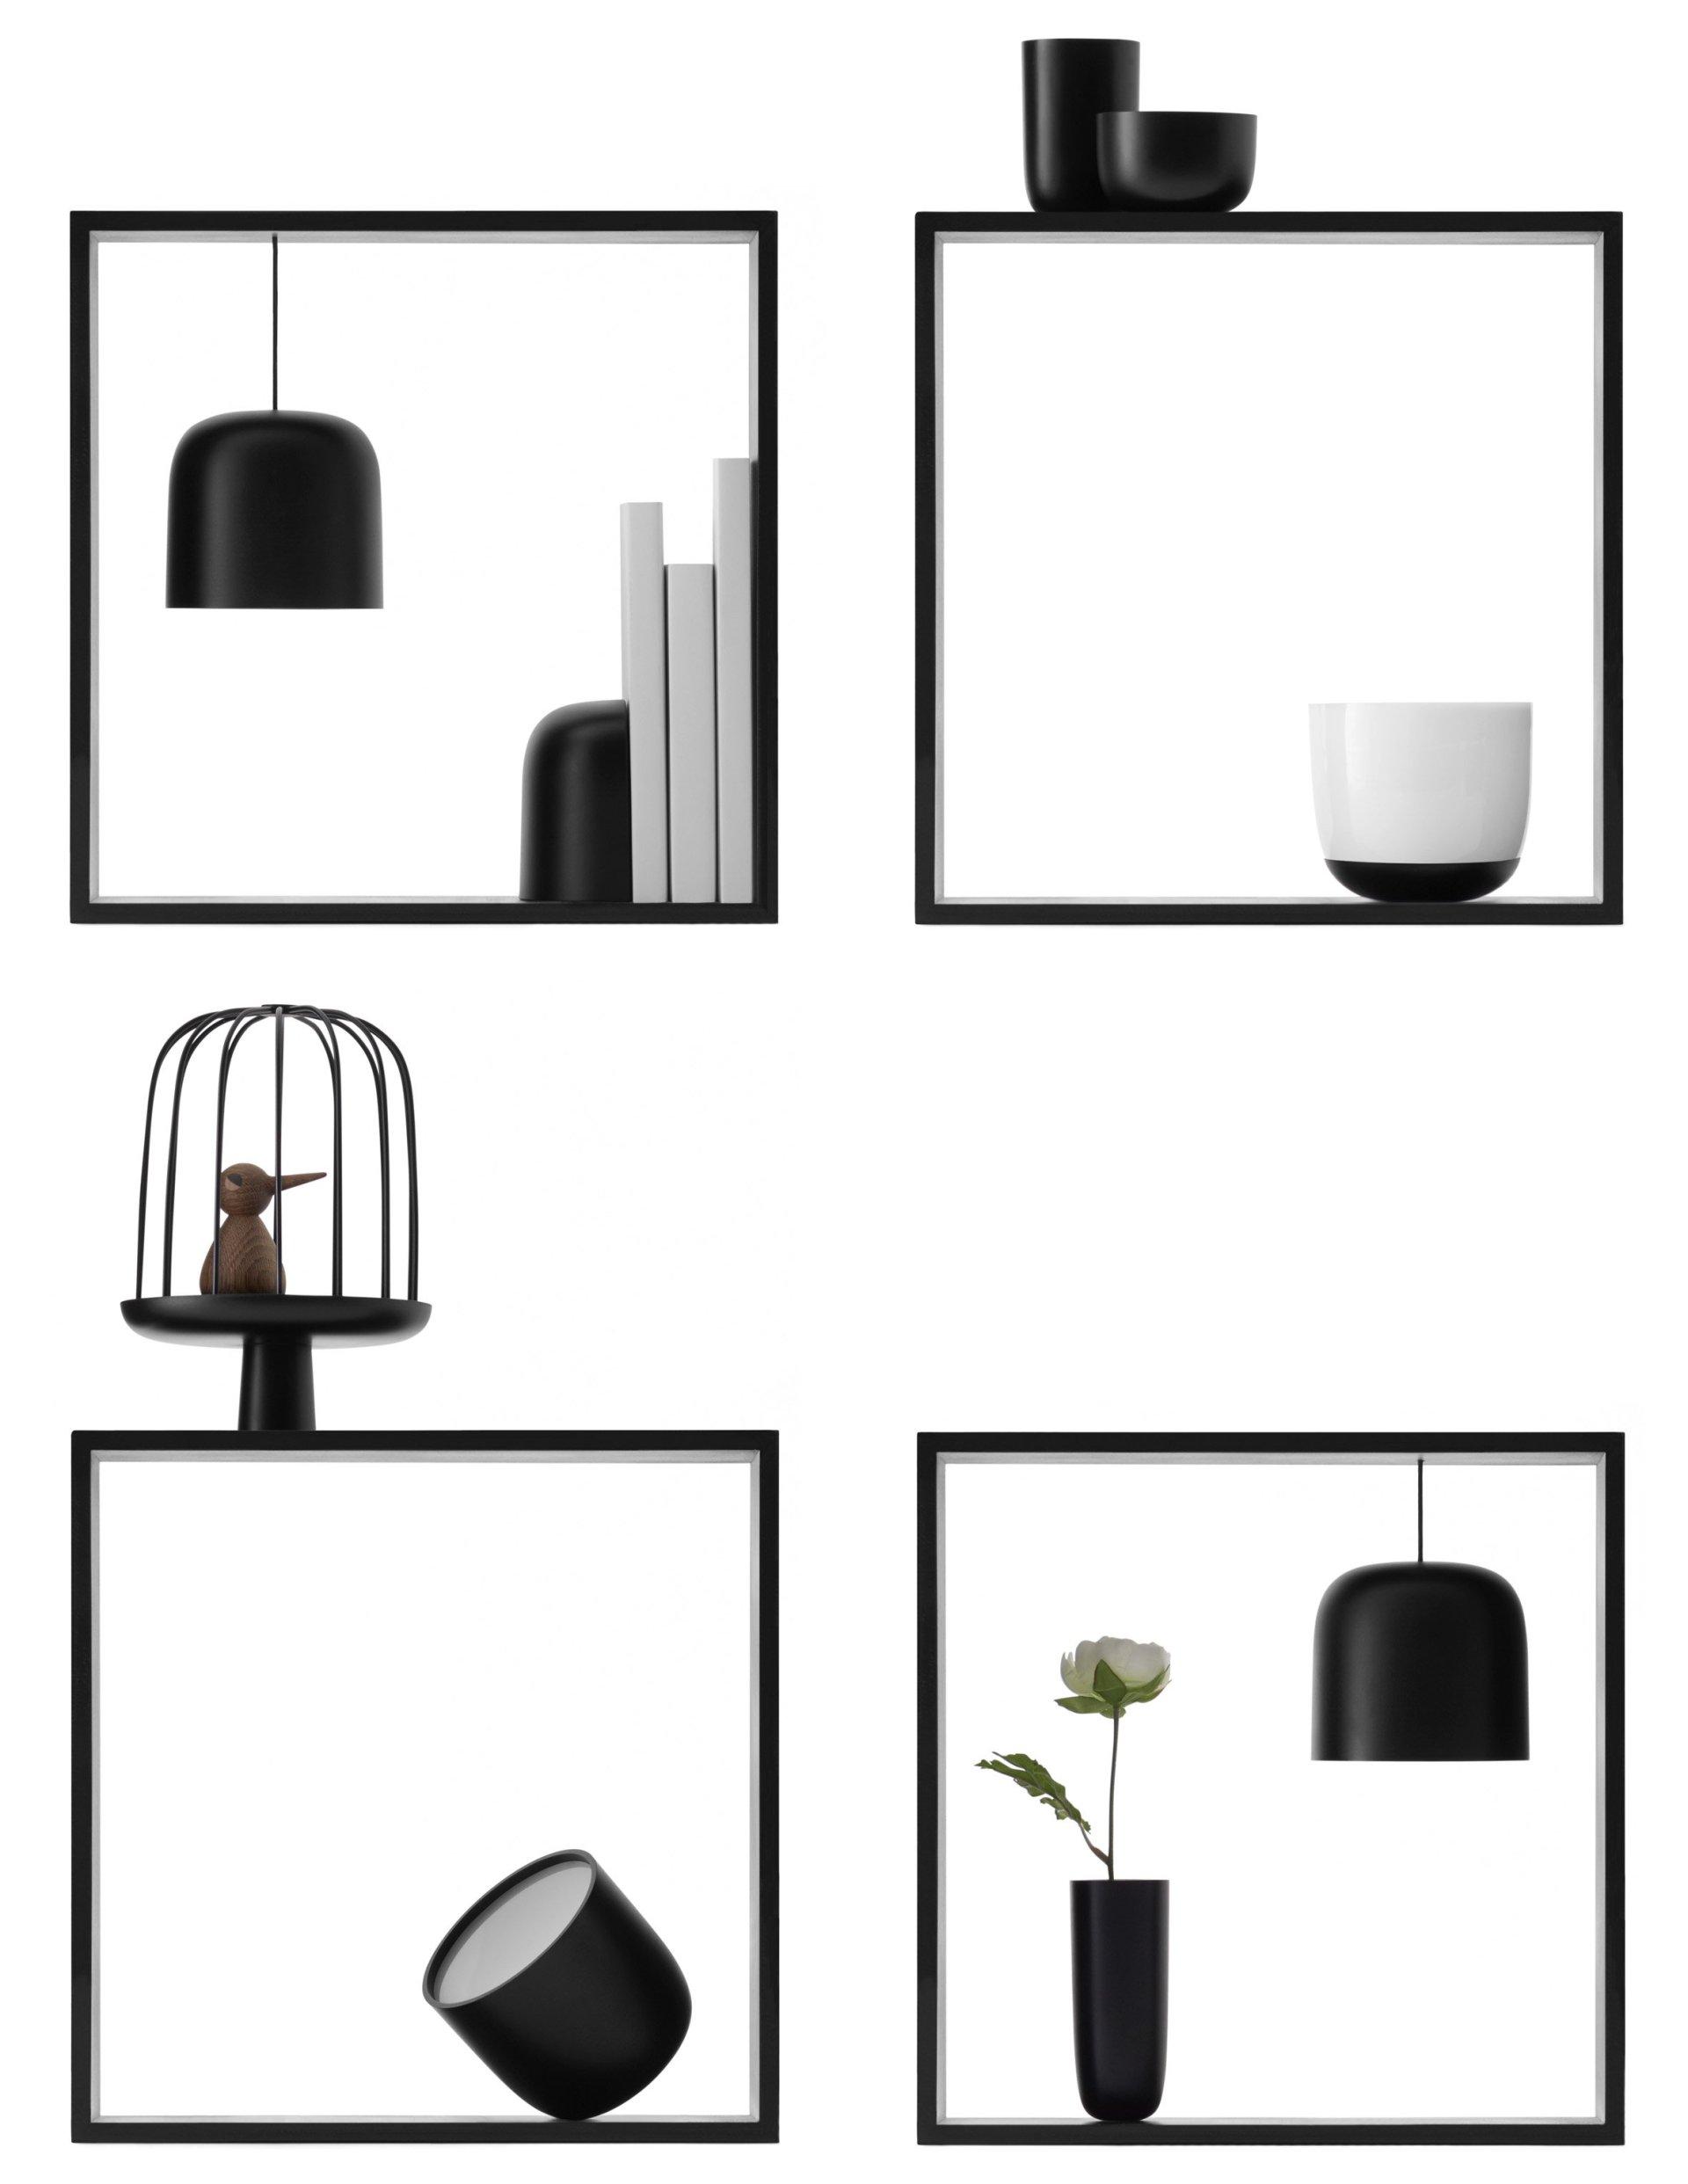 lighting-euroluce-milan-design-week-_-gaku_nendo-_dezeen_2364_col_3.jpg